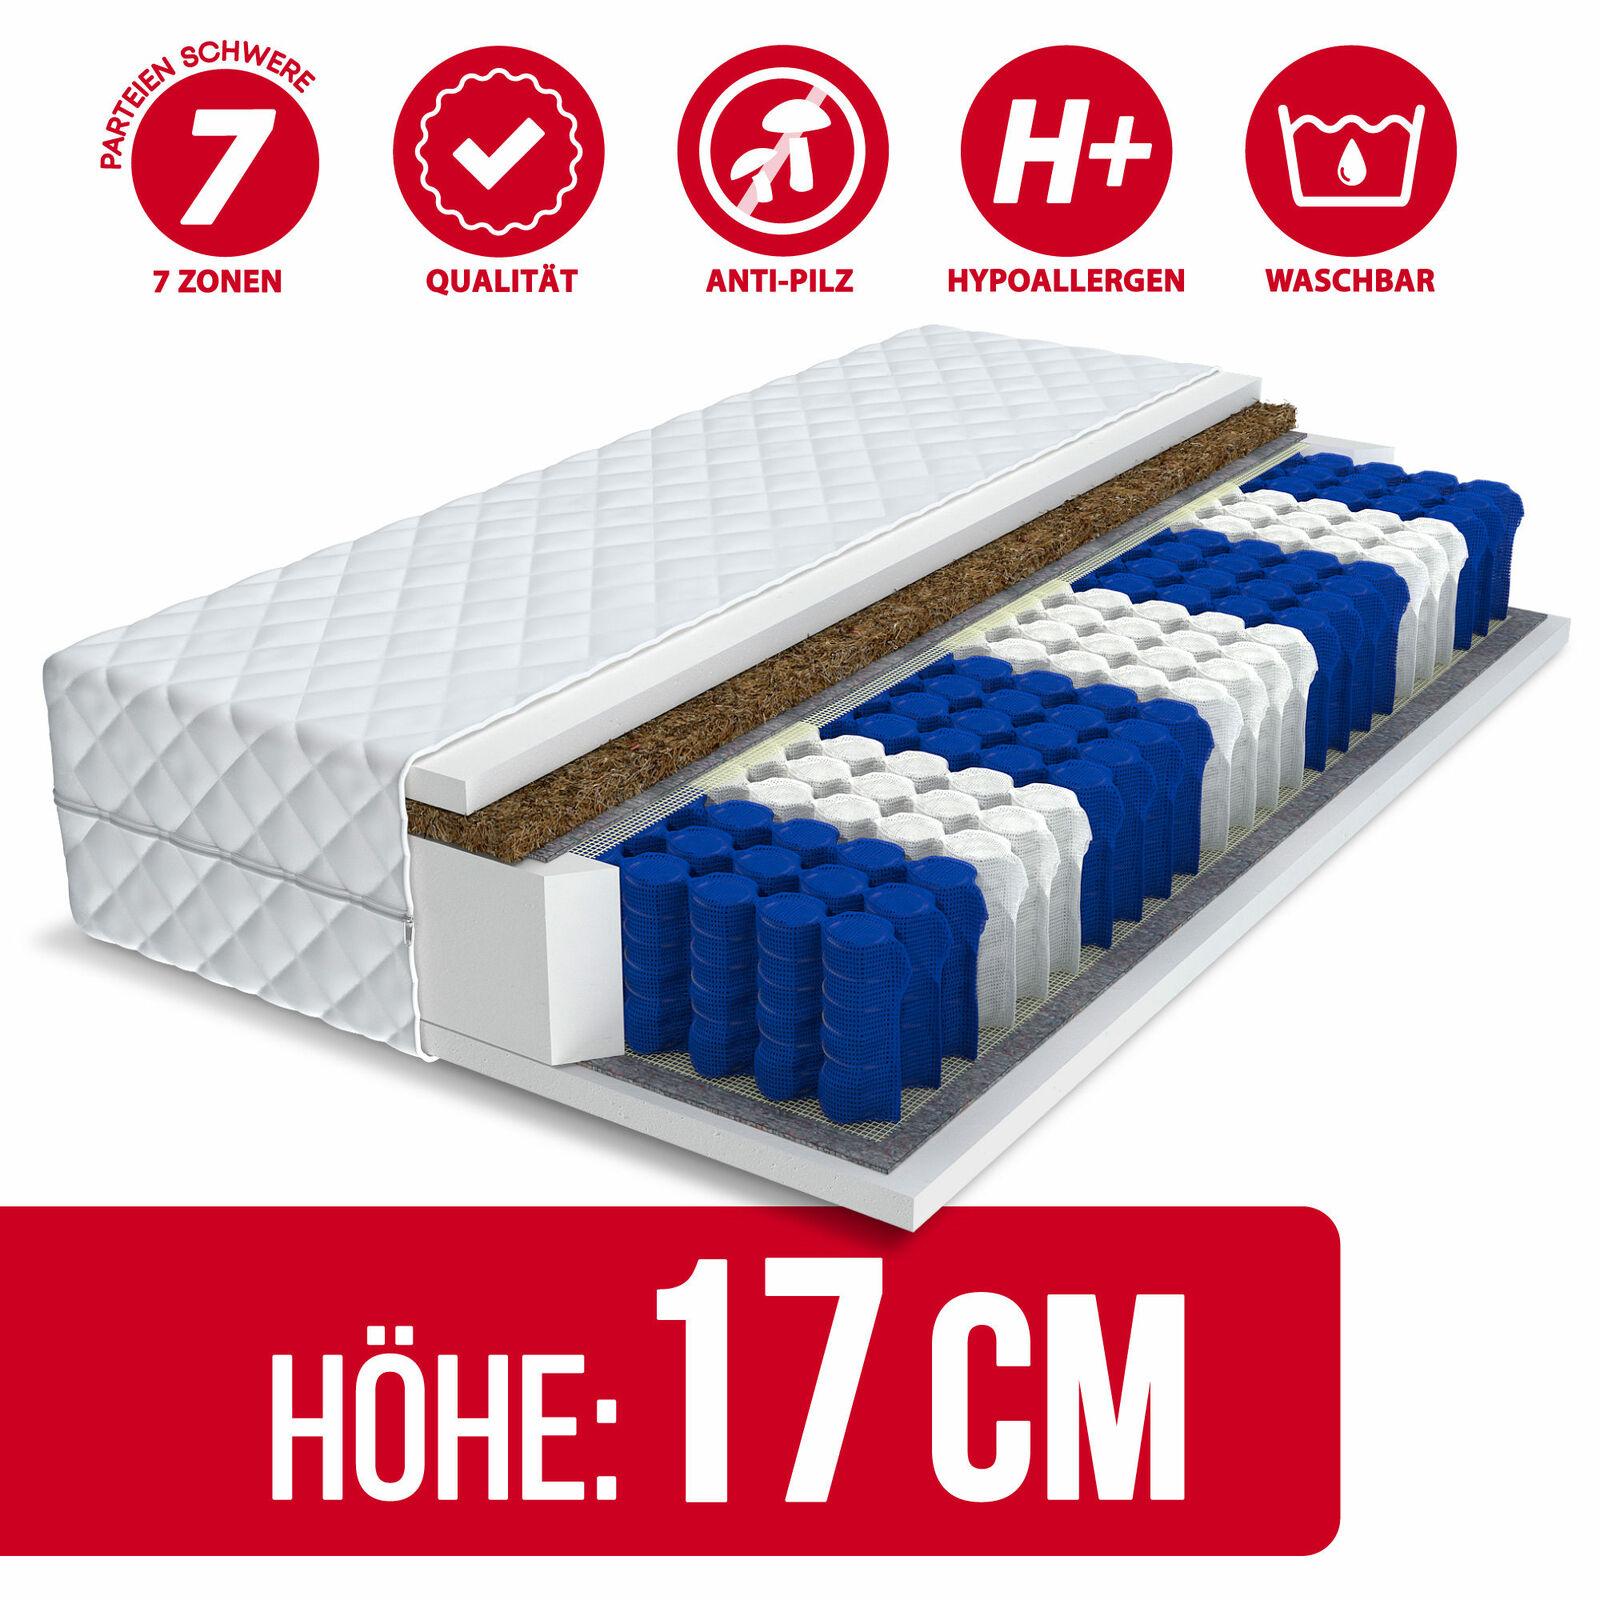 Matratze 90x200 VIDA 7 Zonen H3 Kokos Premium Taschenfederkern Federkern 17cm